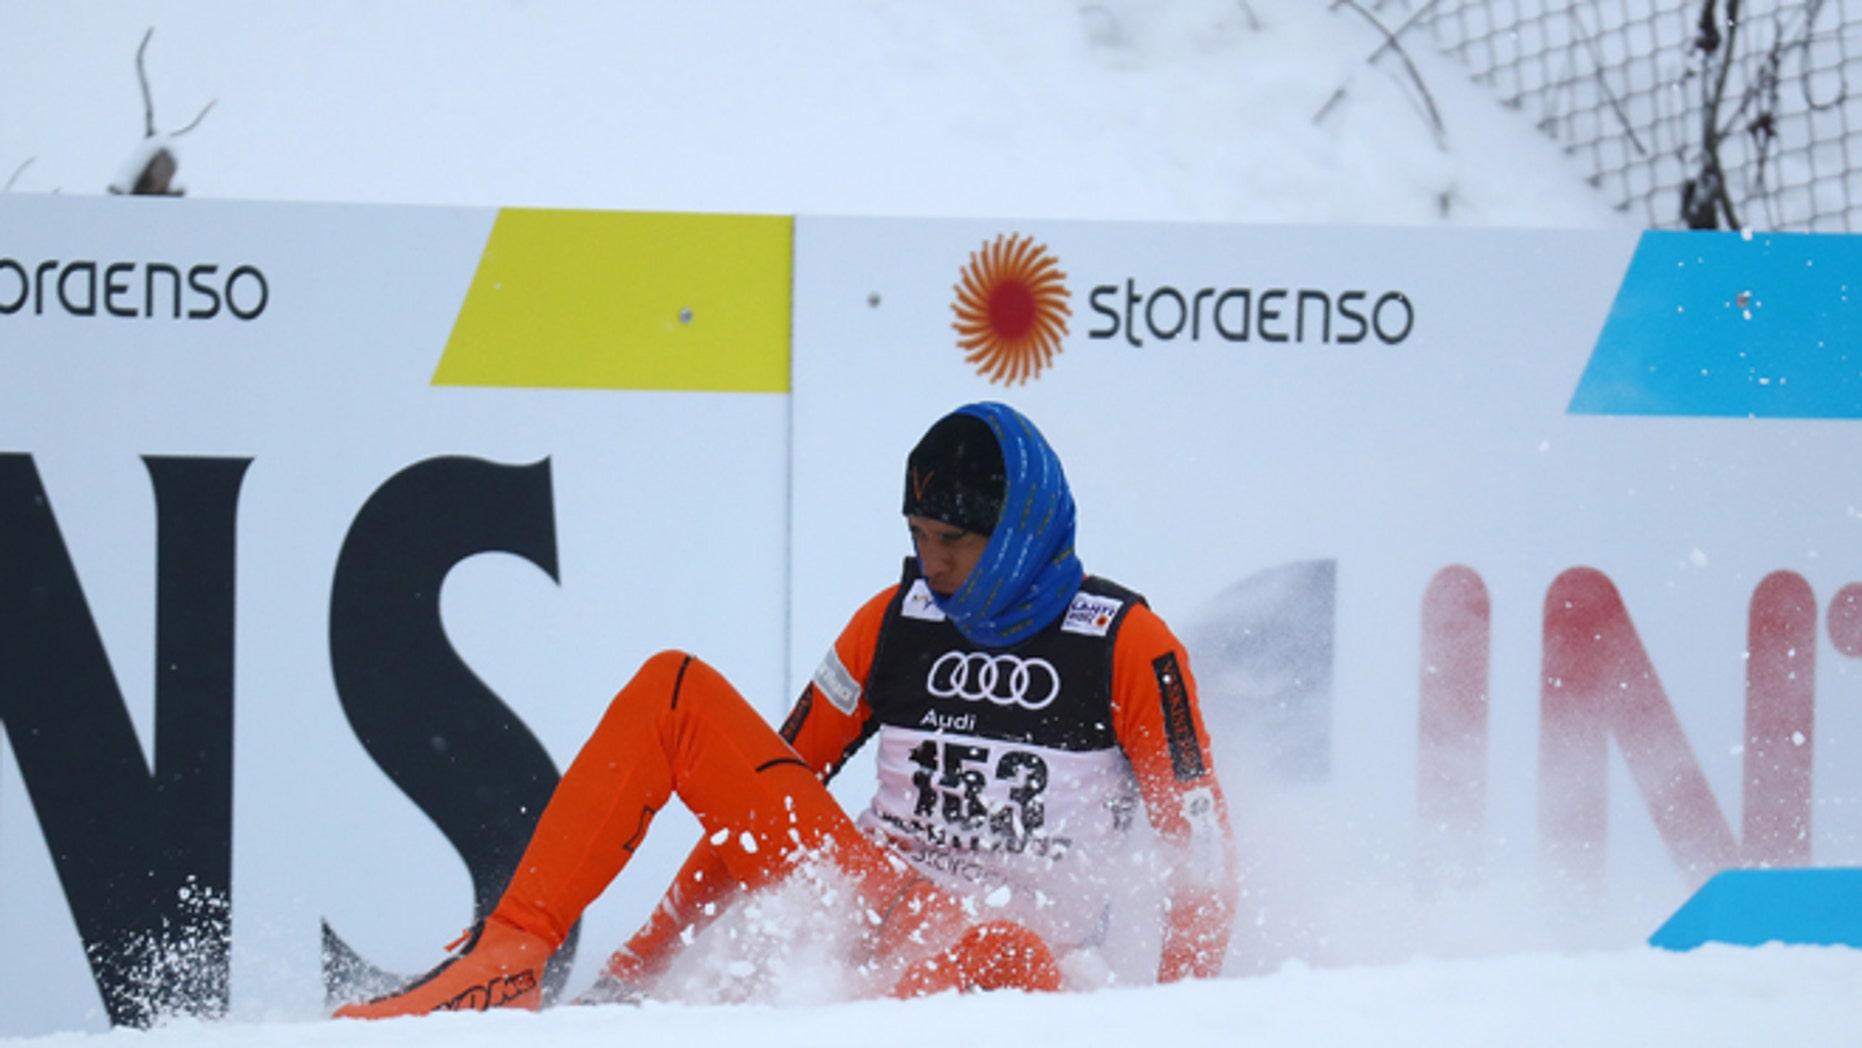 FIS Nordic Ski World Championships - Men's Cross Country - Qualification - Lahti, Finland - 23/2/17 - Adrian Solano of Venezuela crashes during the competition. REUTERS/Kai Pfaffenbach   - RTSZZXX